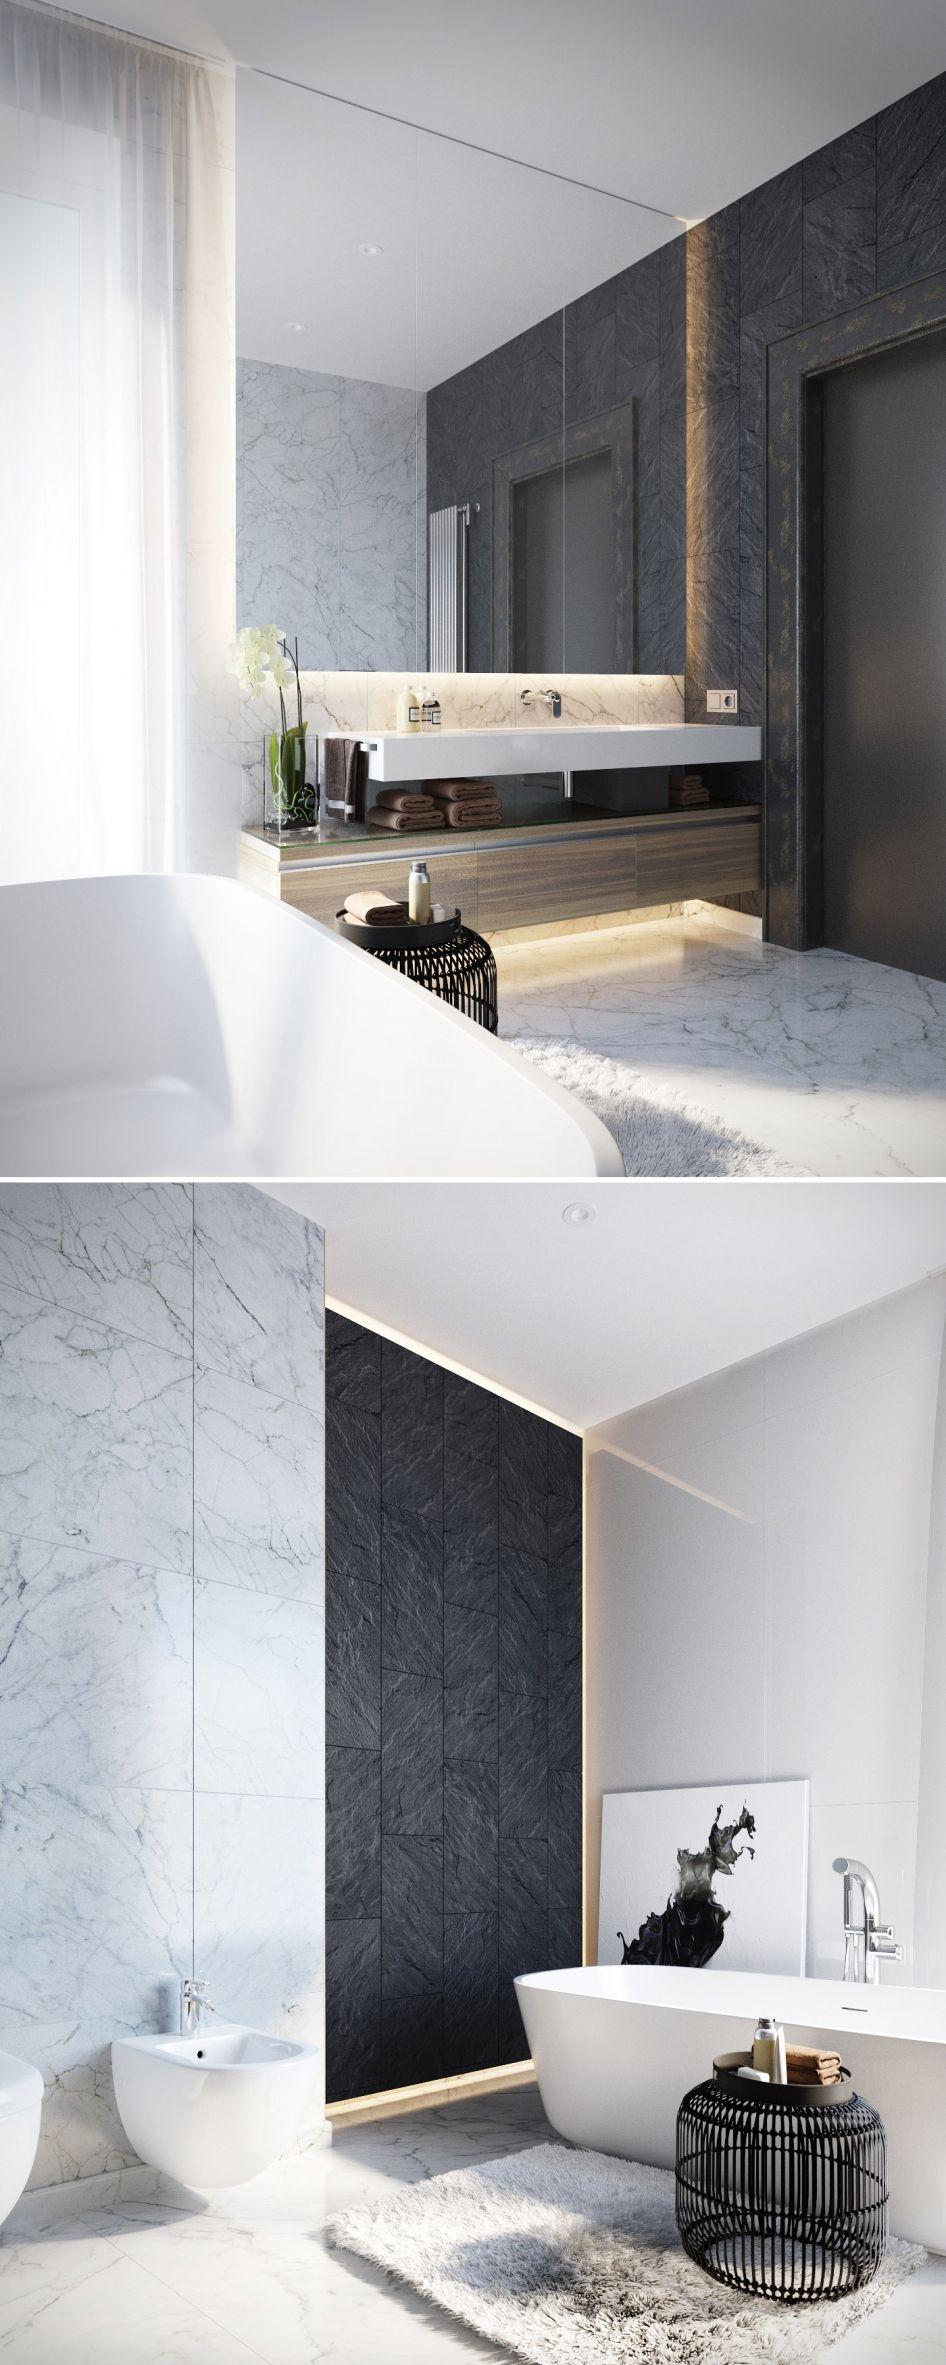 Badezimmerdesign 7 x 5 bathroom  Галерея ddd  bathroom  pinterest  indirect